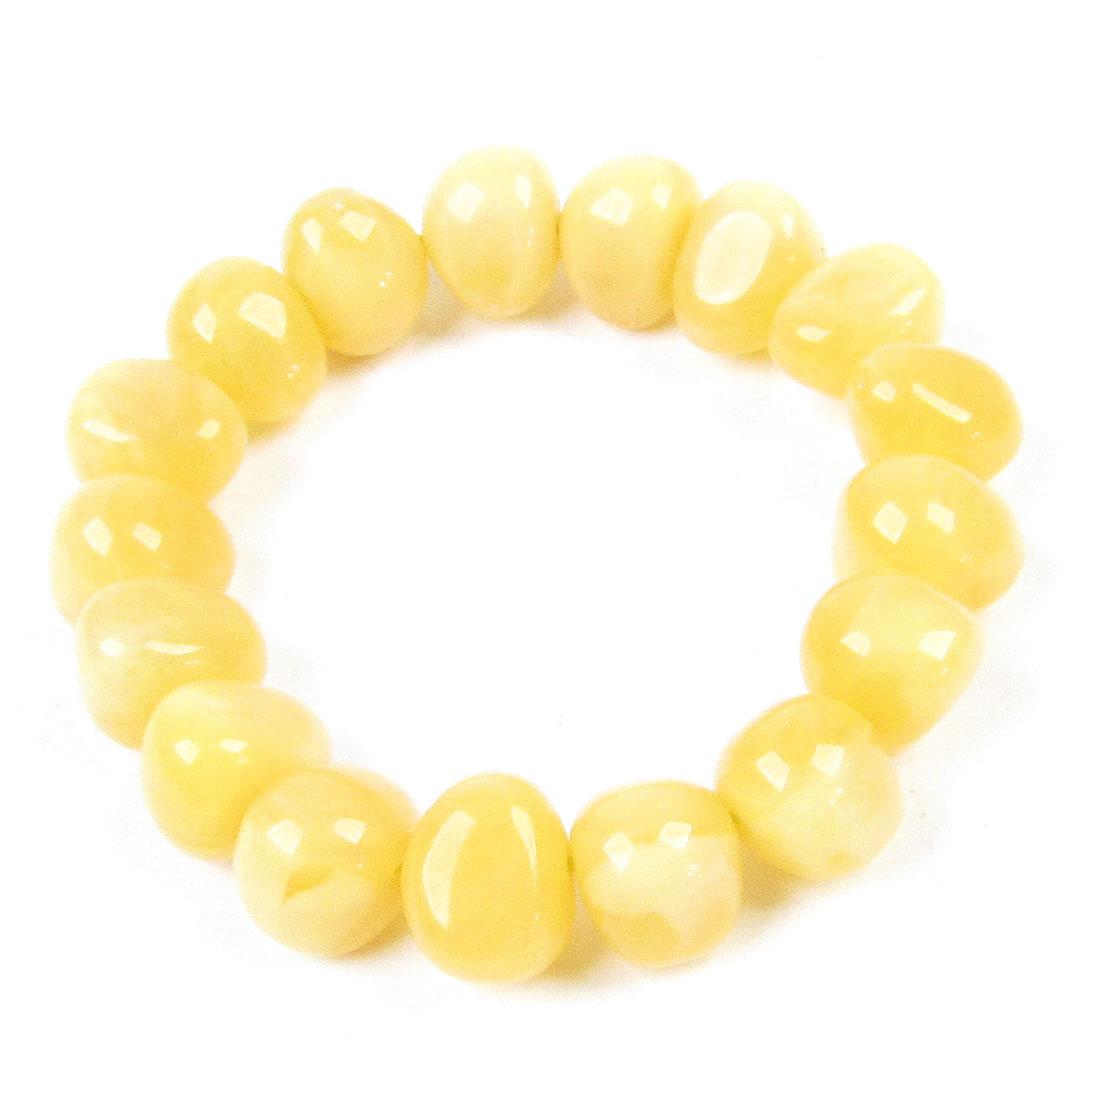 Irregular Plastic 17 Beads Stretchy Wrist Bracelet Light Yellow